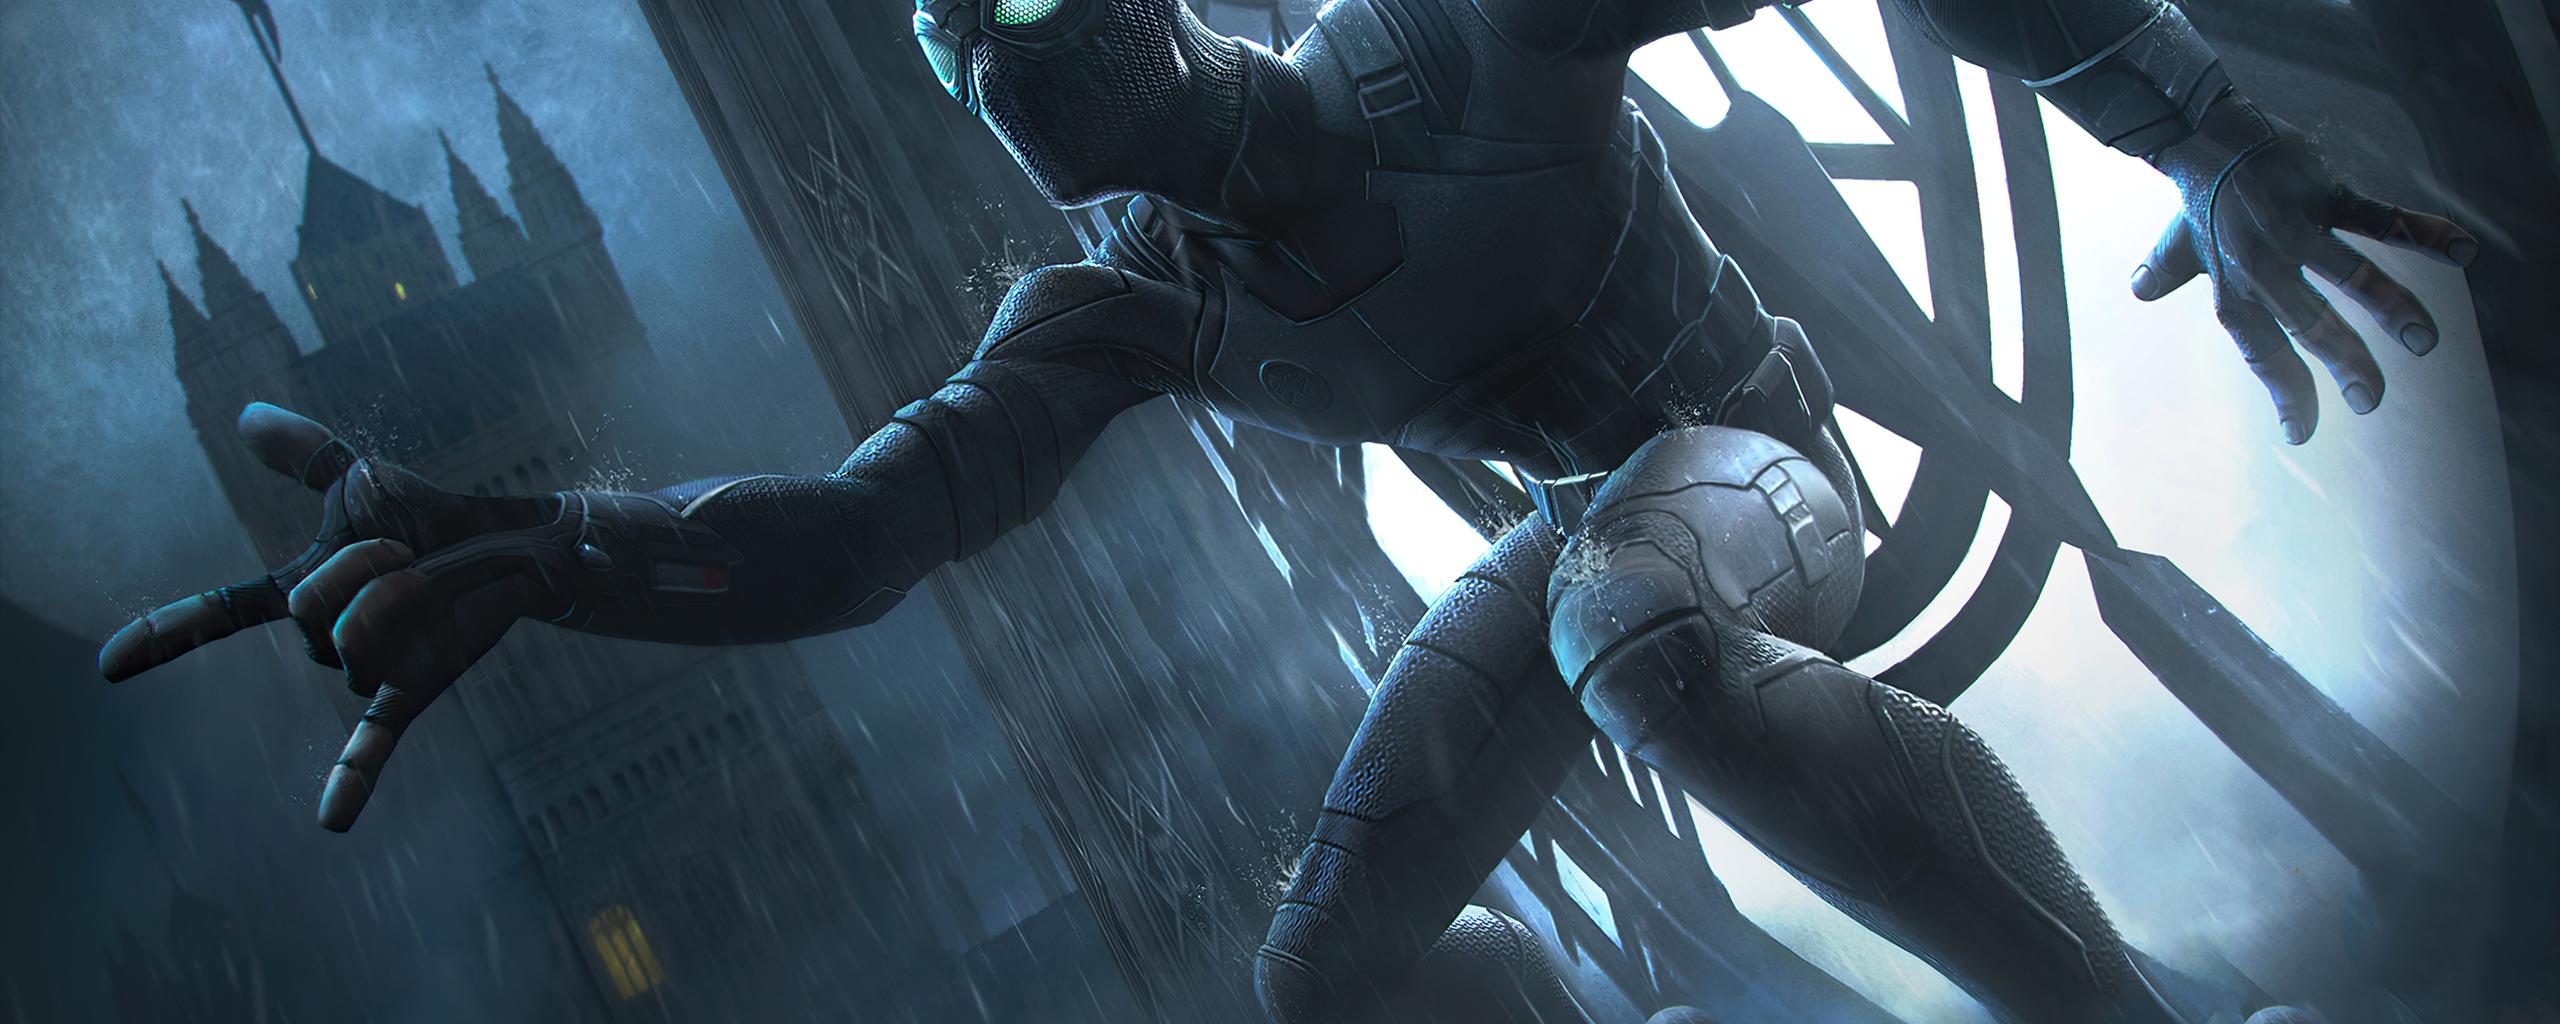 2560x1024 Black Spiderman Marvel Contest Of Champions 4k ...